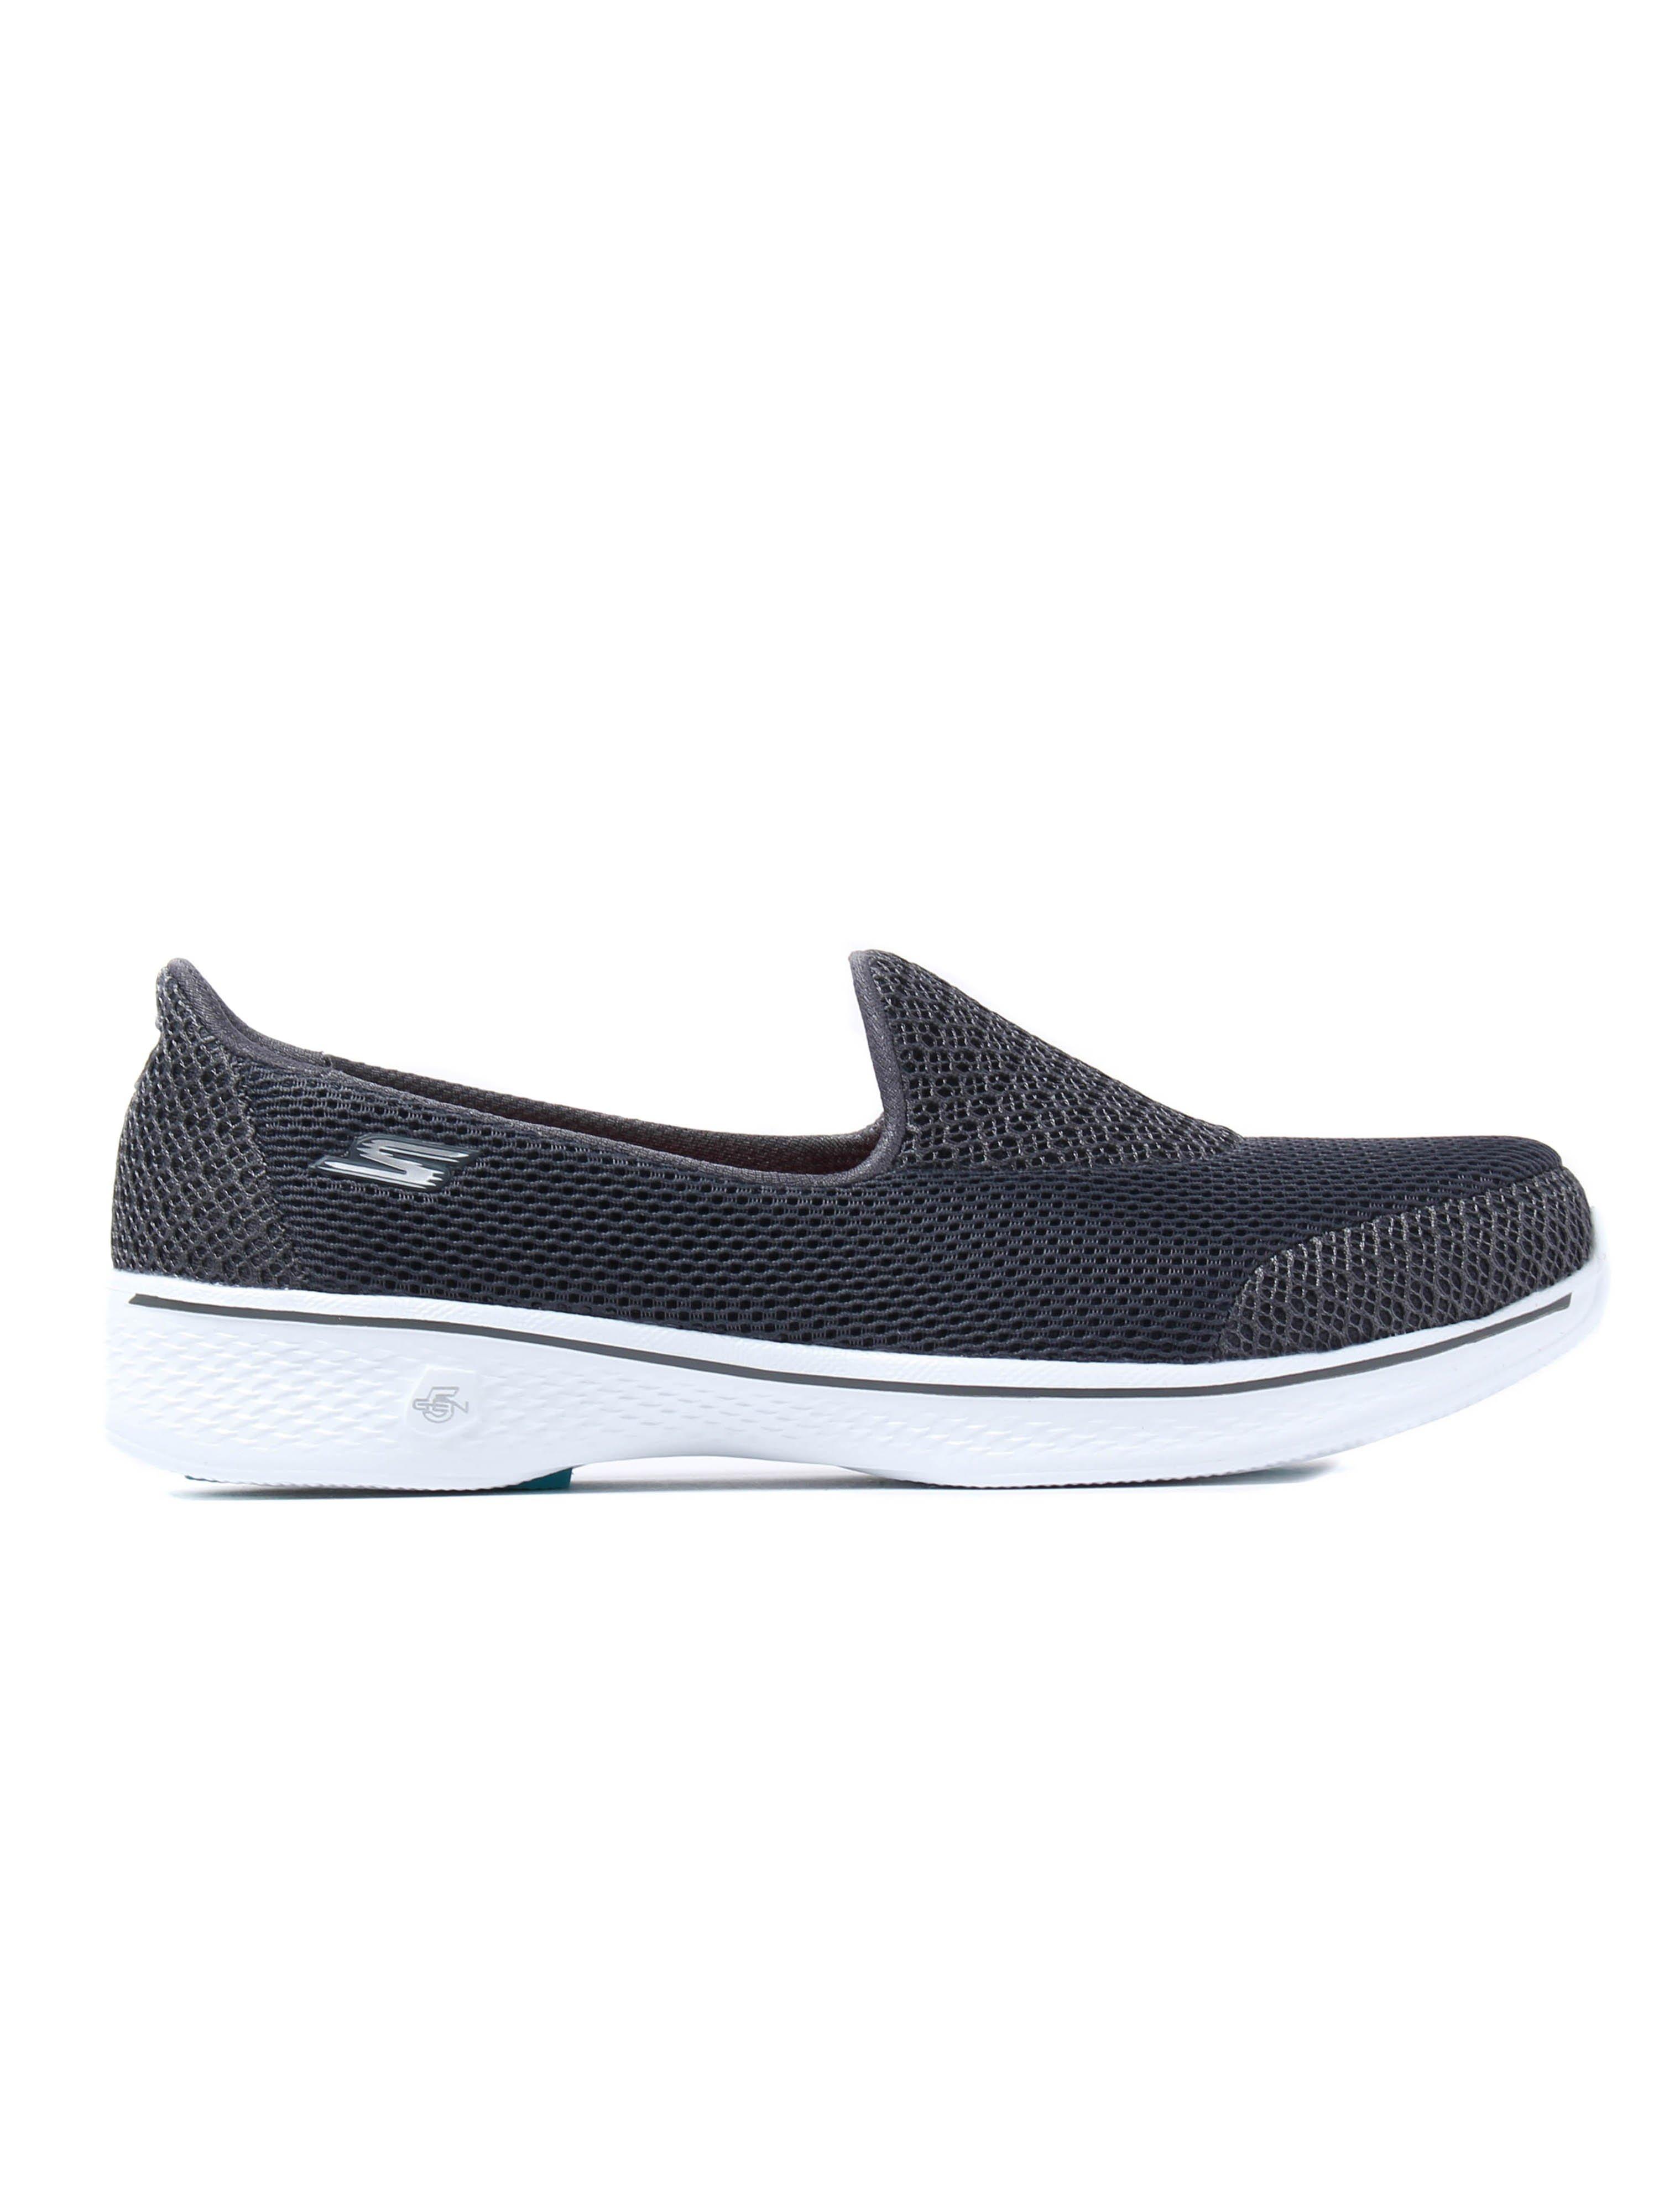 skechers yoga mat shoes. skechers women\u0027s go walk 4 propel trainers - charcoal yoga mat shoes